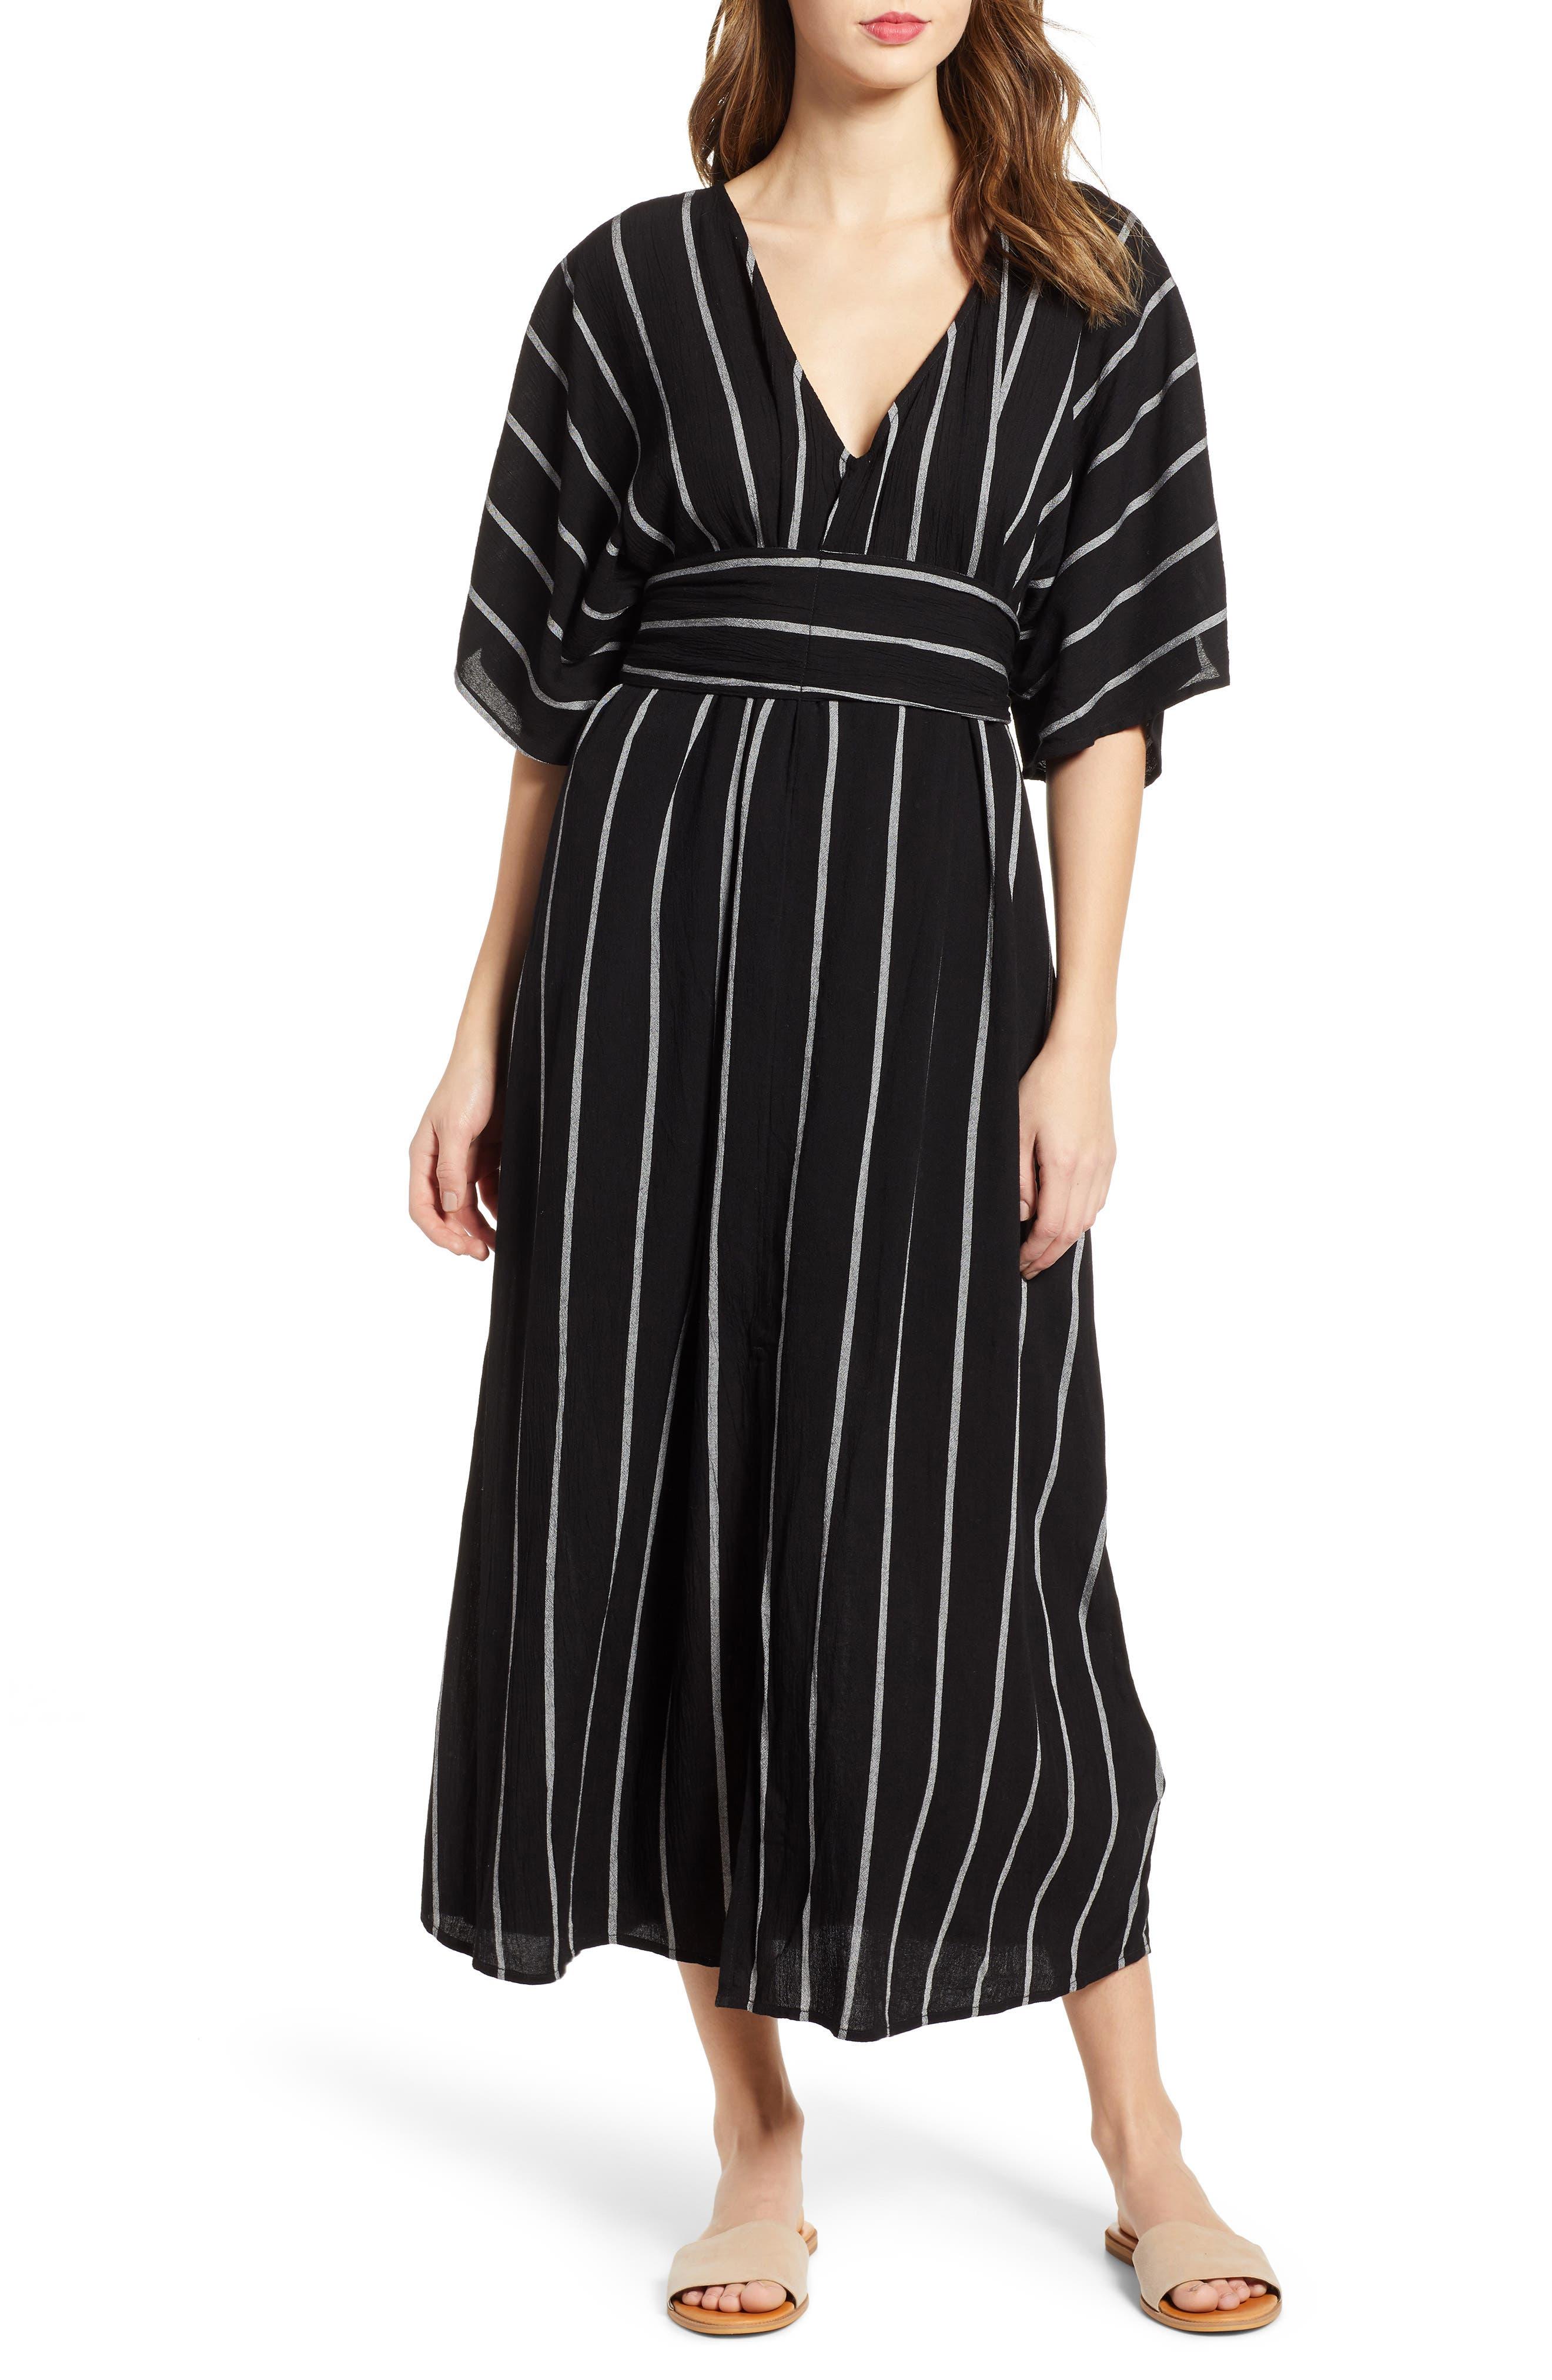 BILLABONG, Forever Fine Dress, Main thumbnail 1, color, BLACK